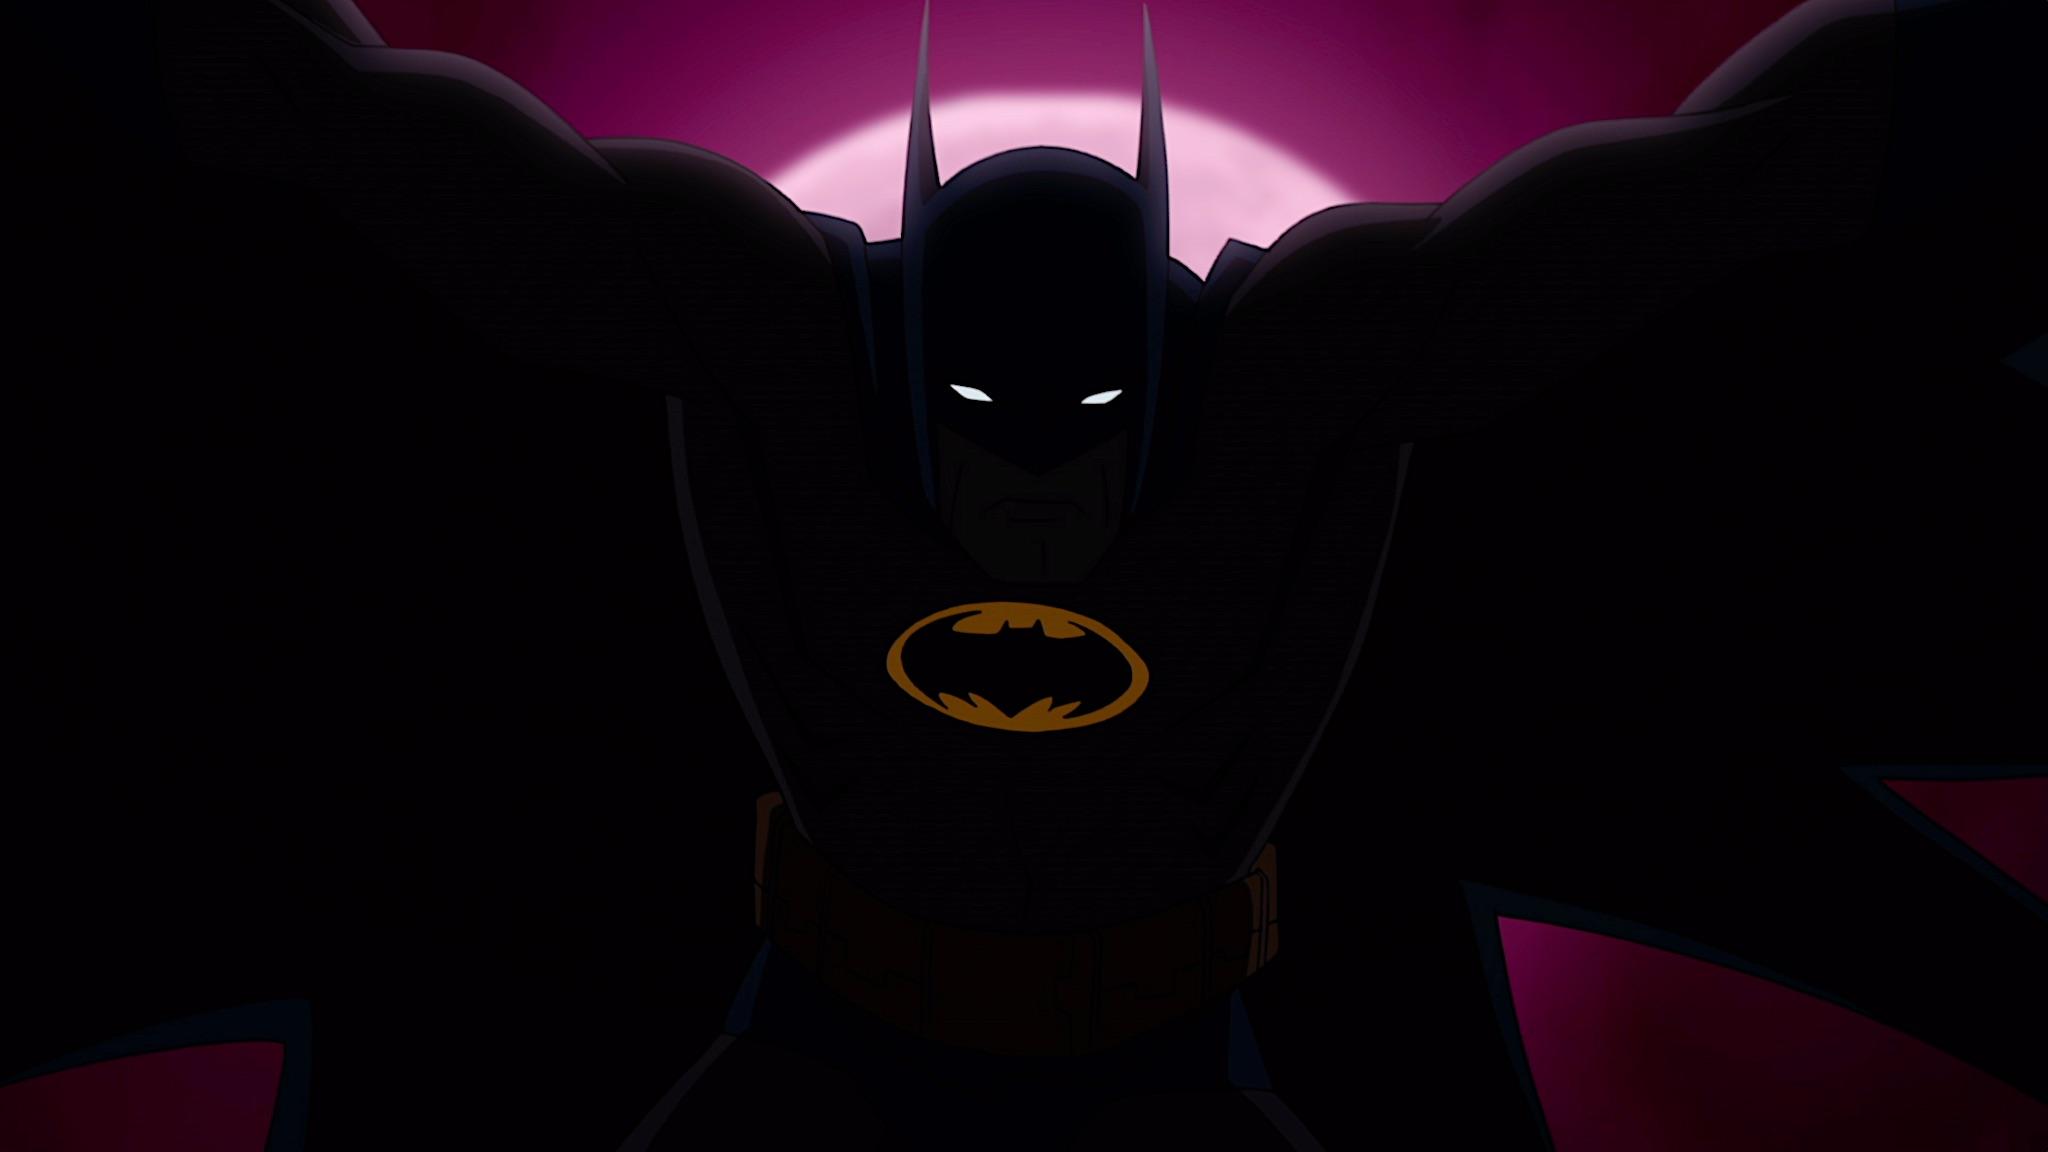 Batman-TMNT Bat silhouette